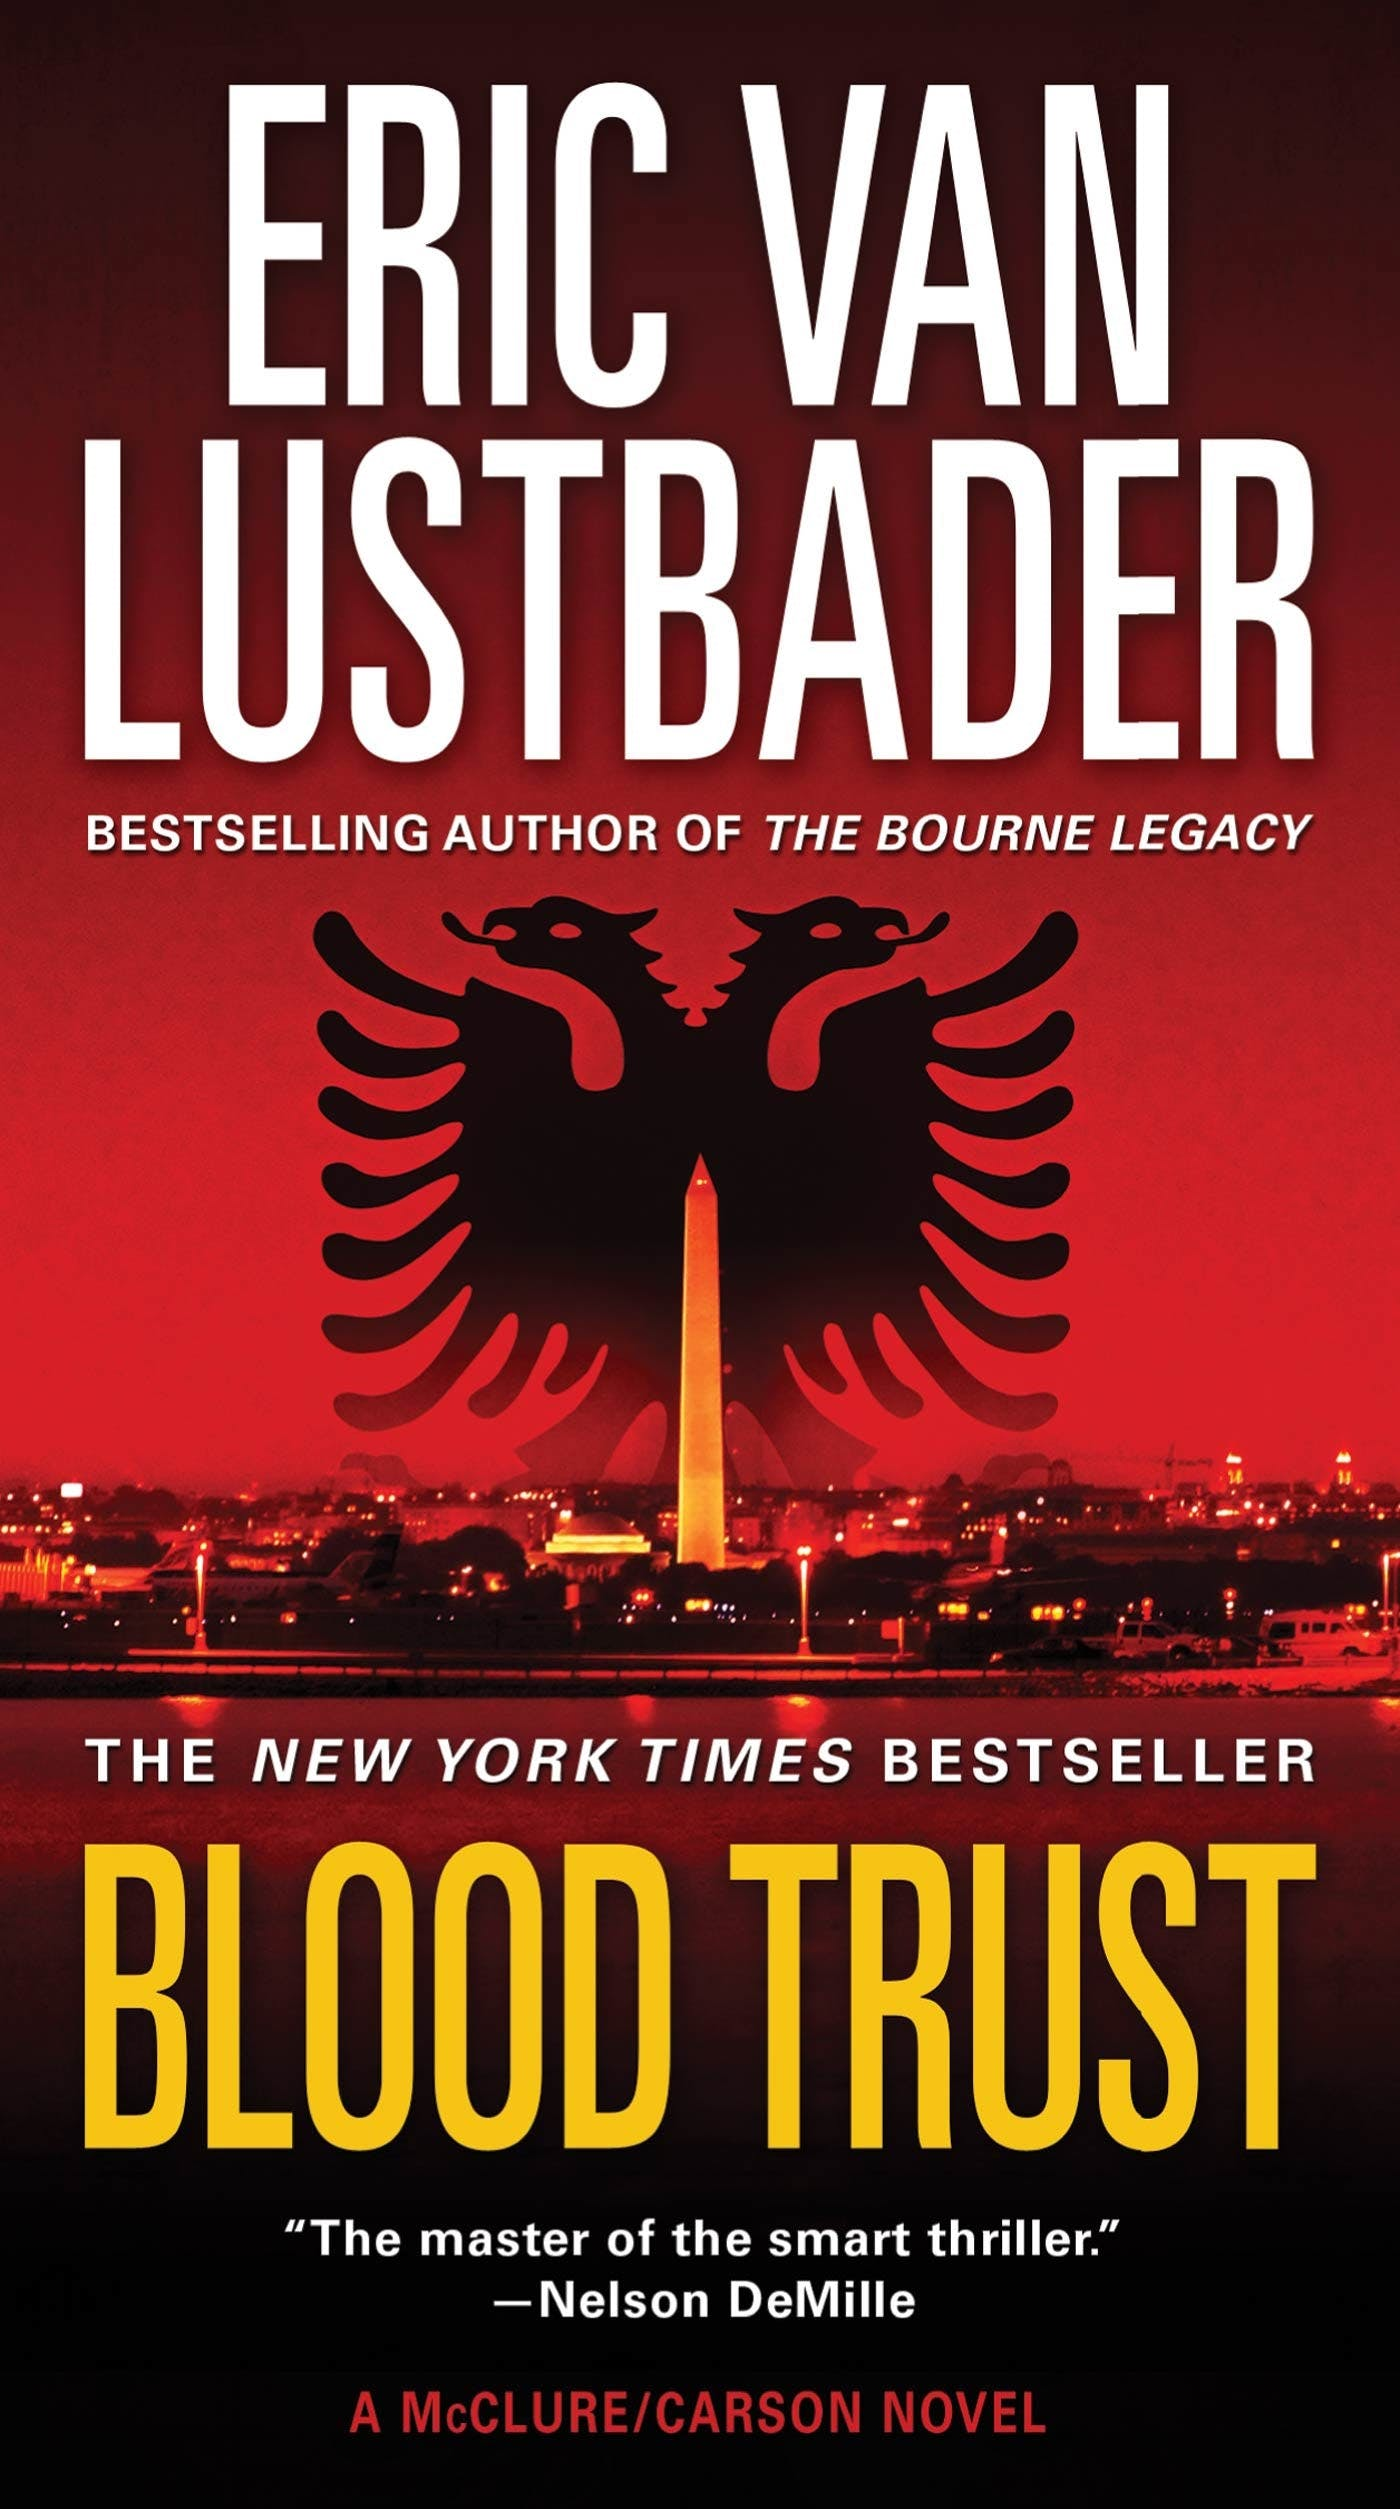 Image of Blood Trust